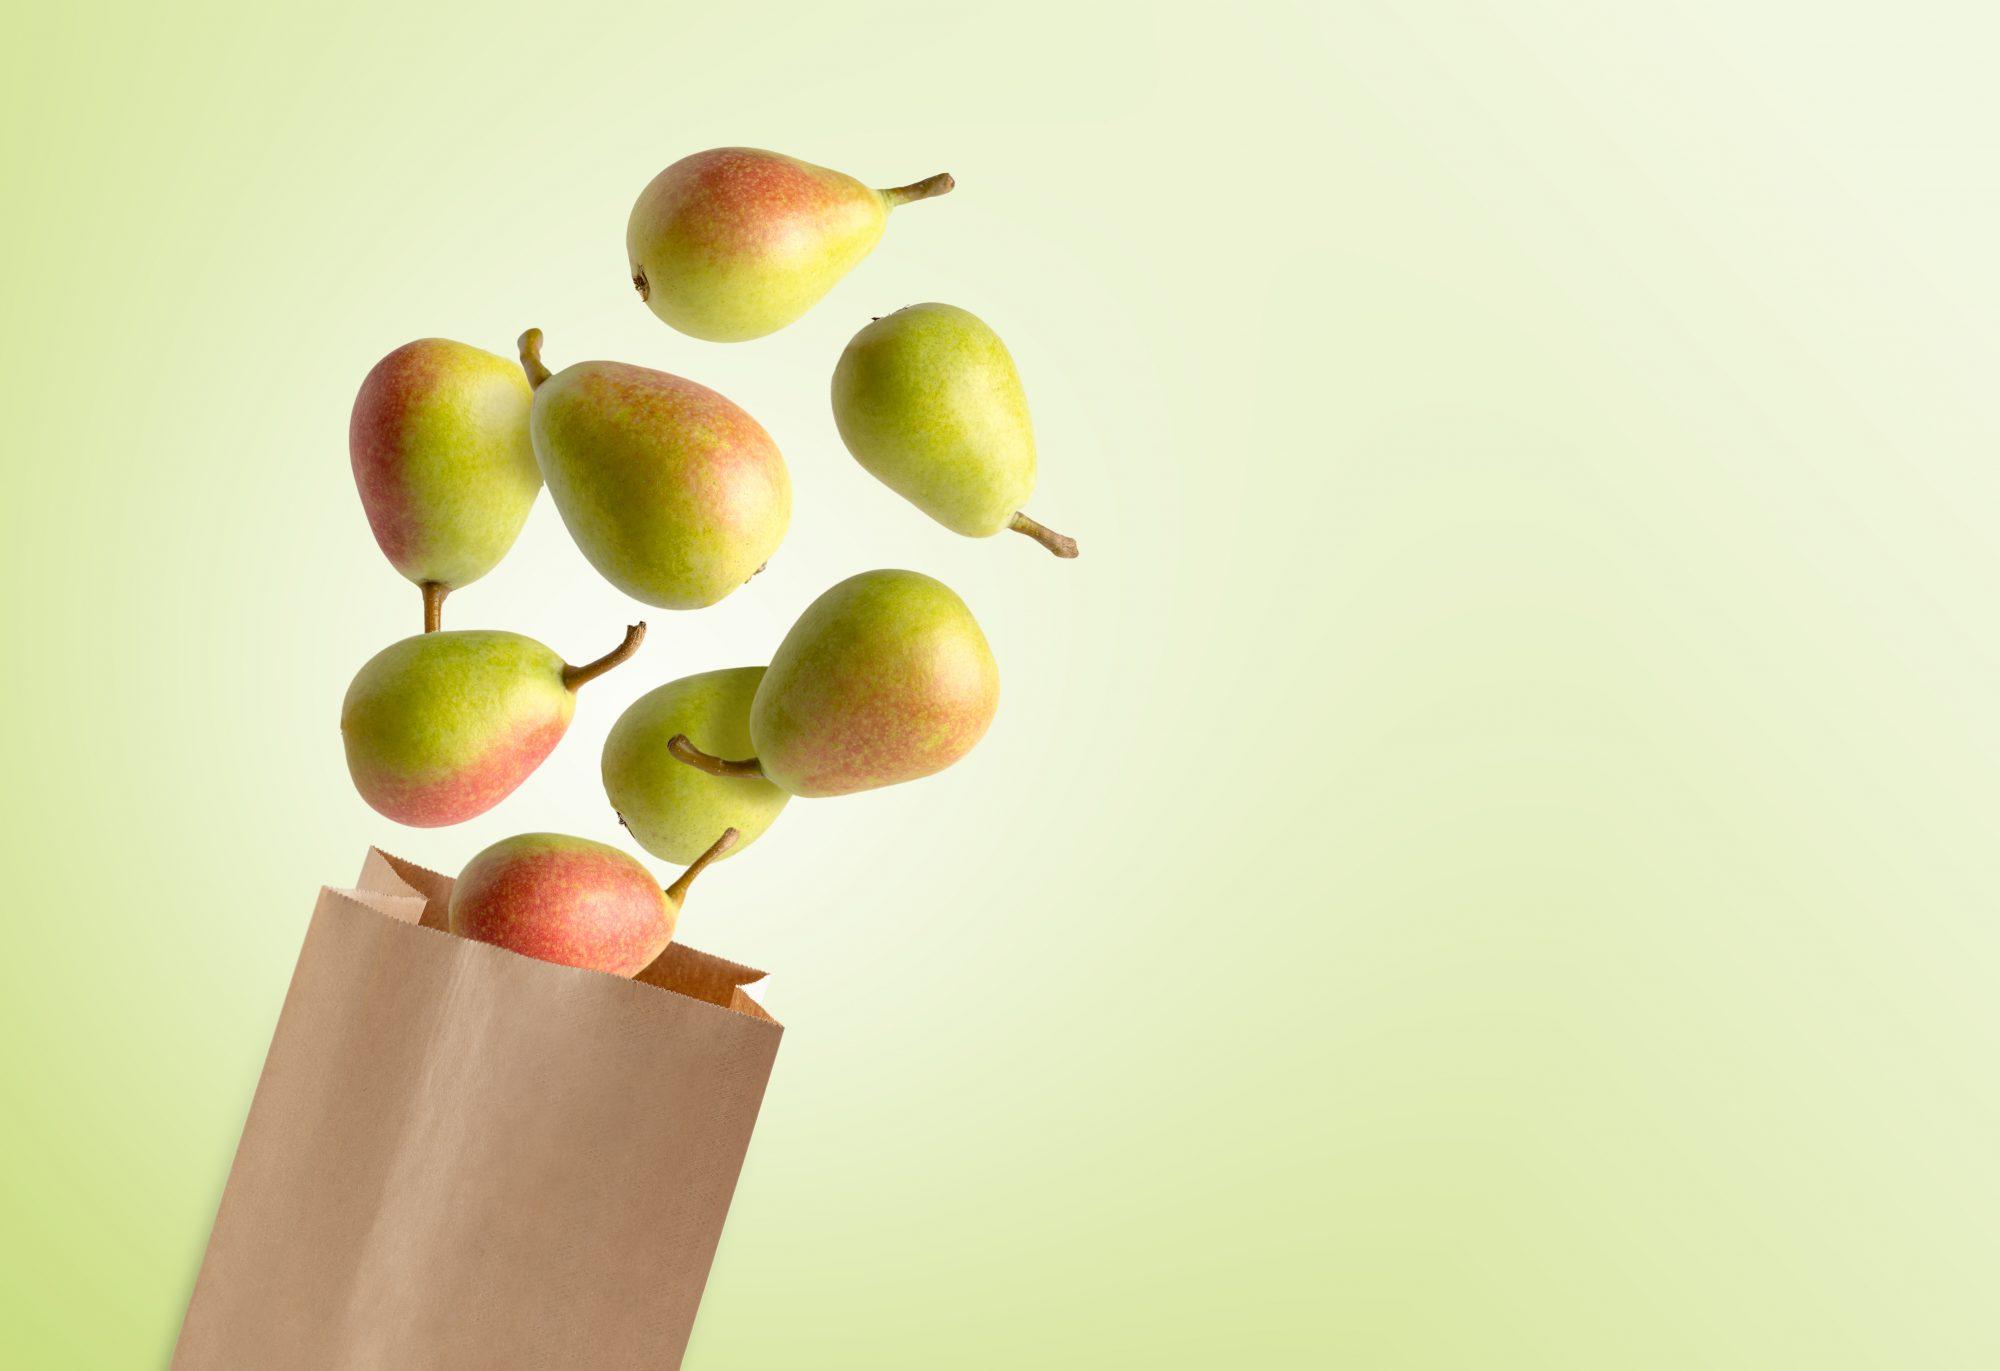 Pears in bag Getty 9/3/20